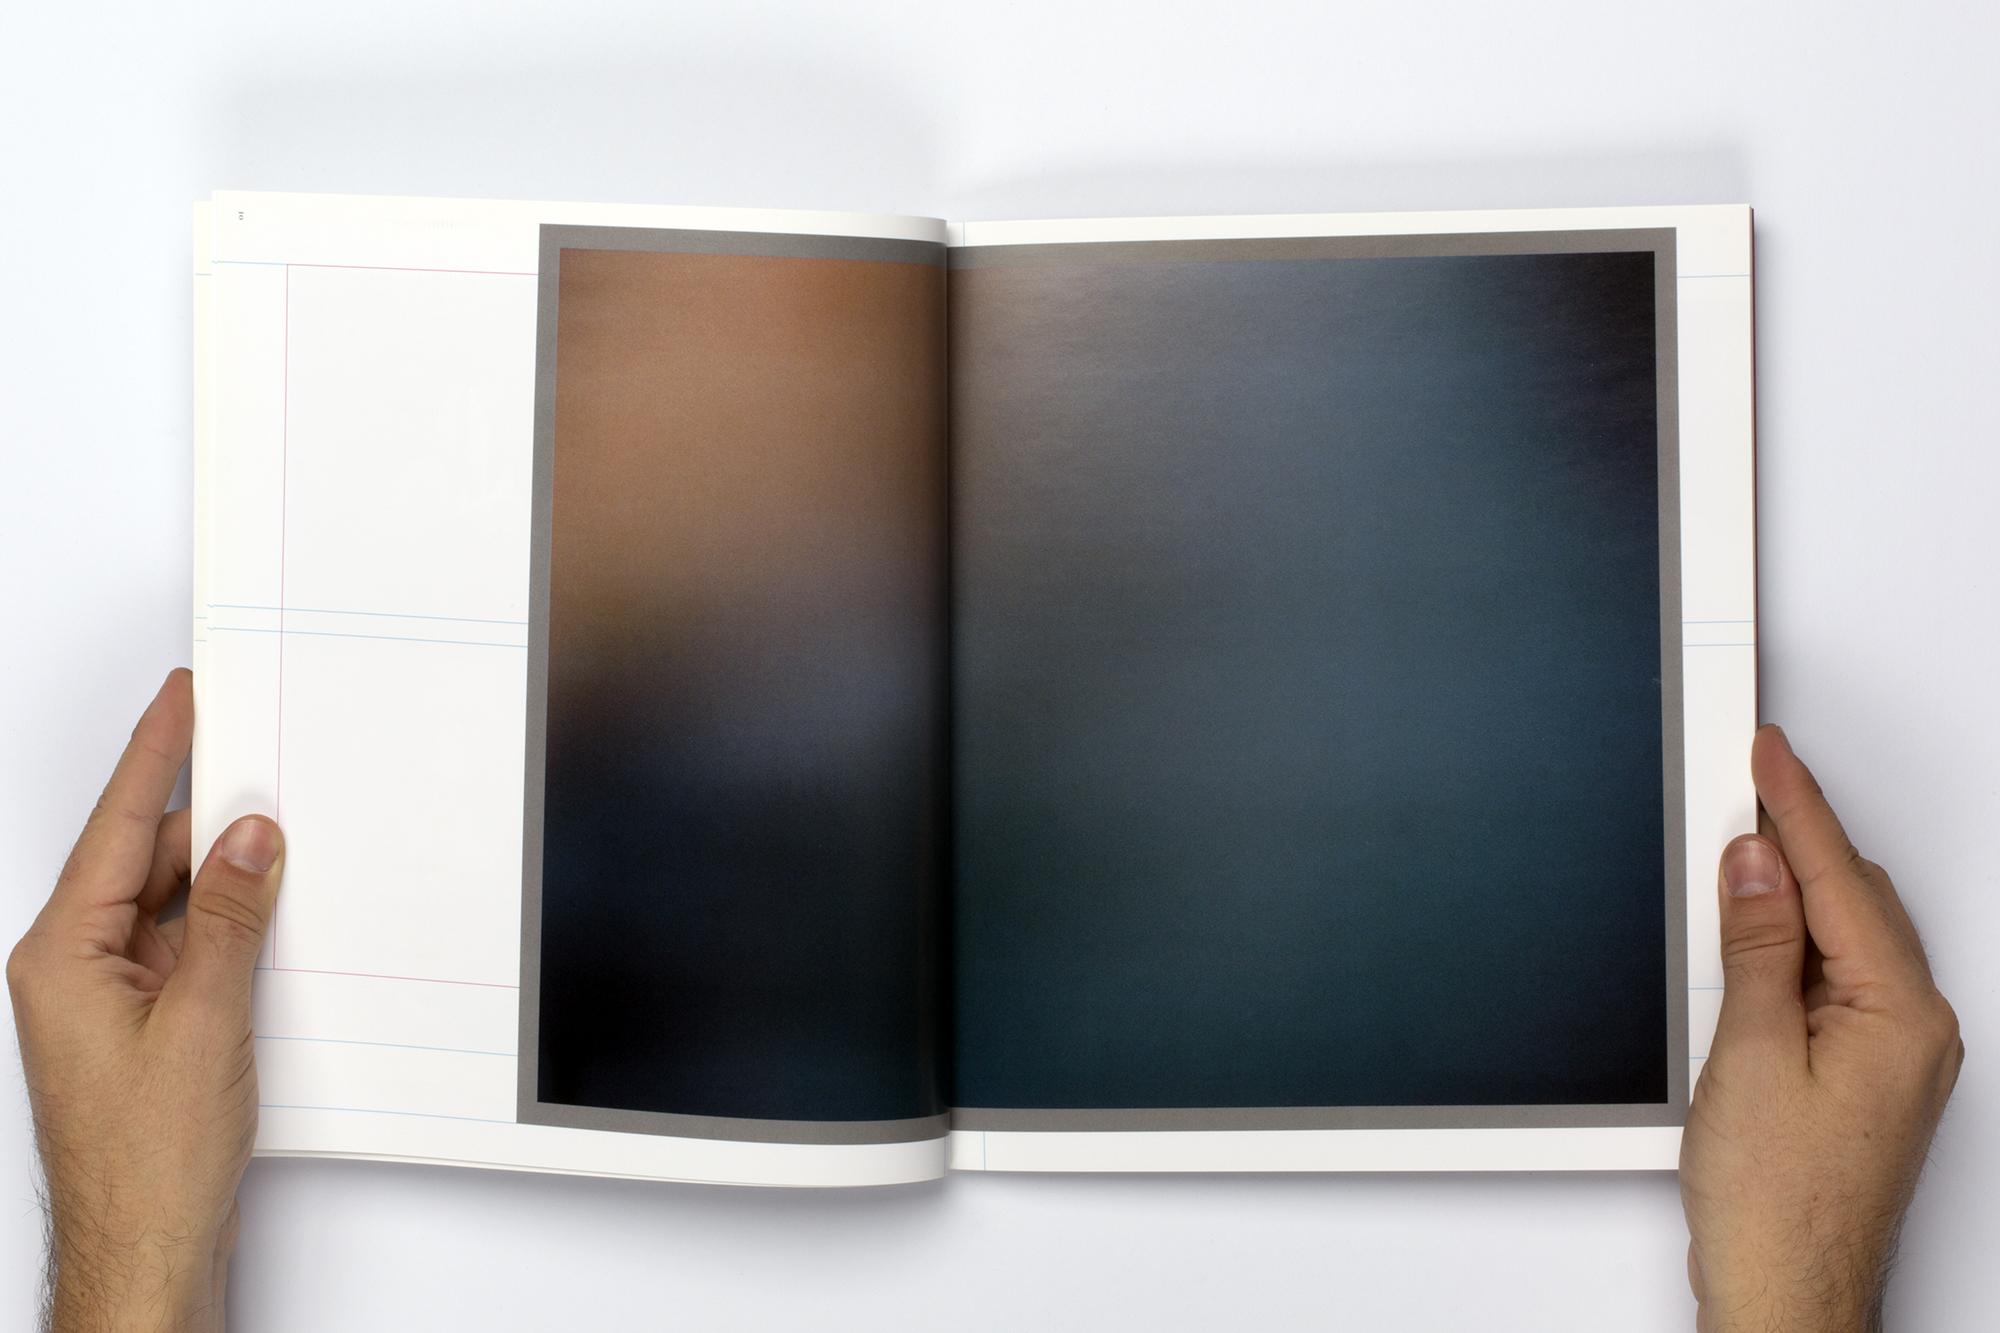 Blind Spot Magazine, No. 46, guest editor, 2013.